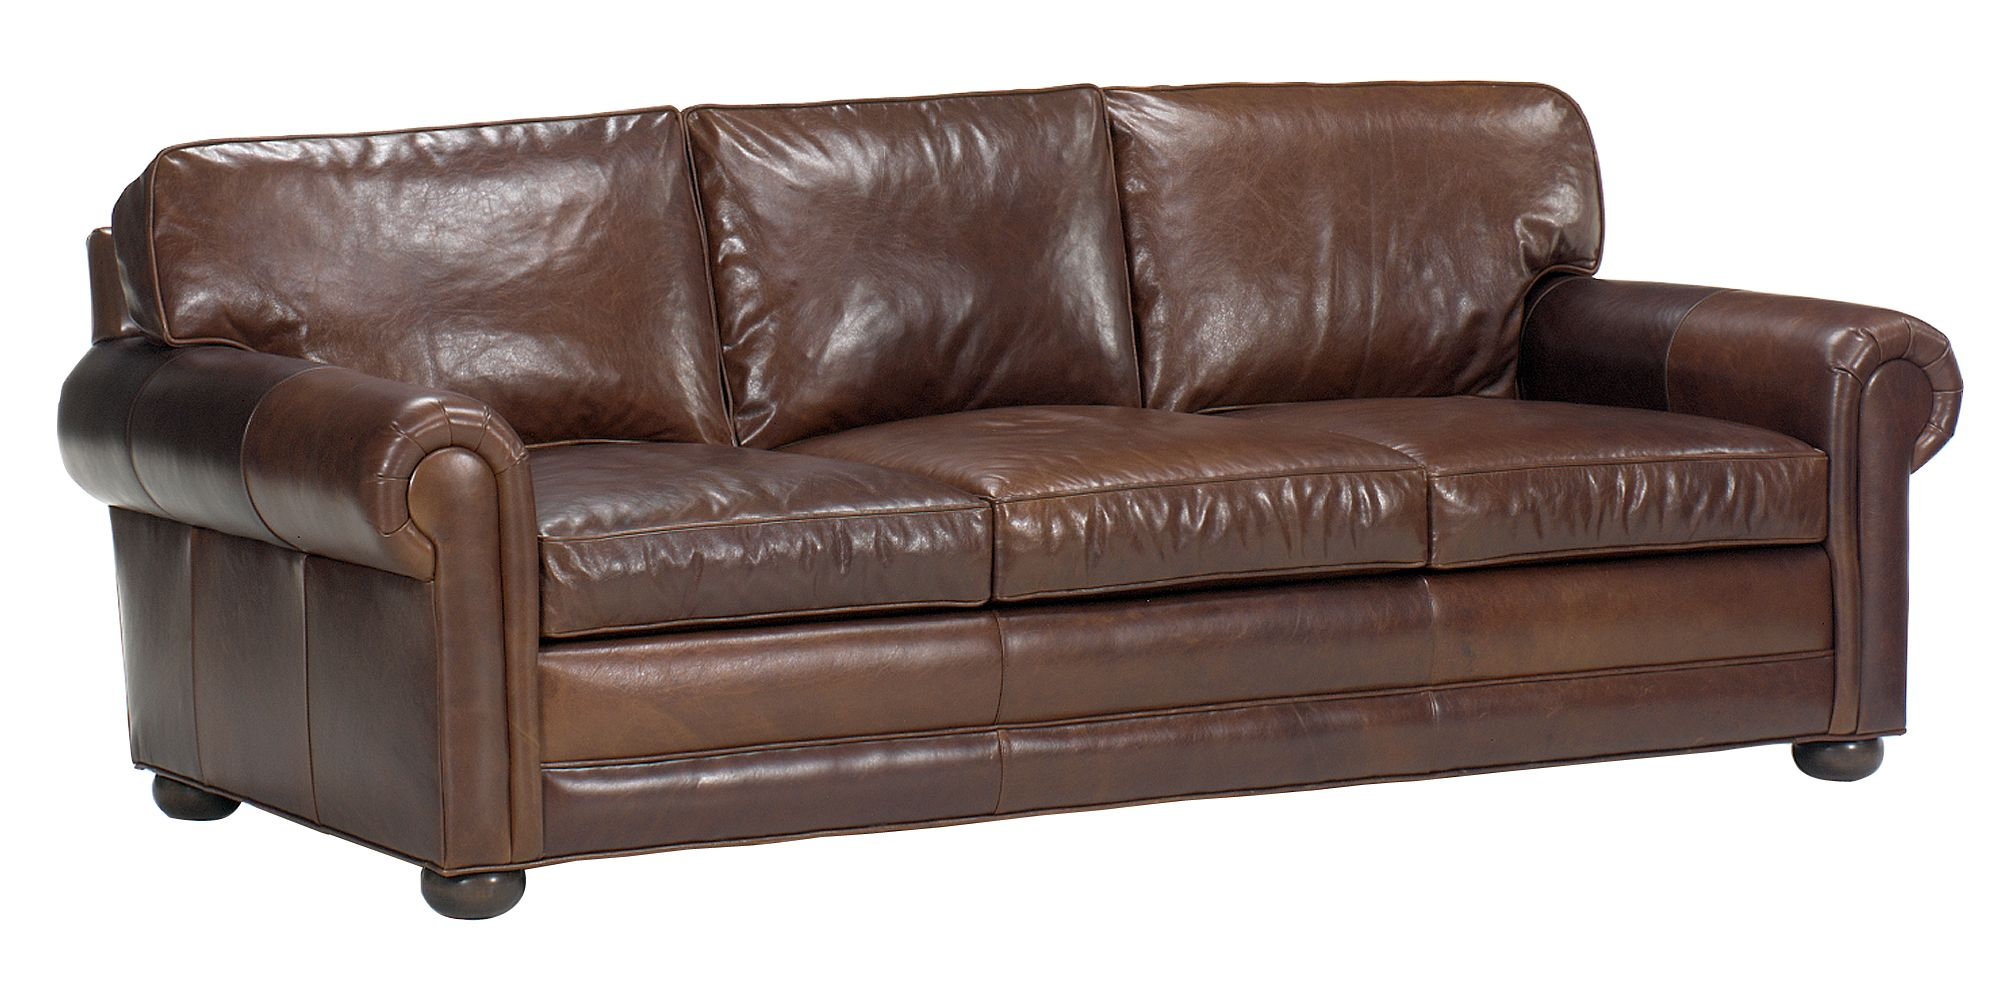 Sheffield Designer Style Deep Seated Leather Furniture Like Lancaster